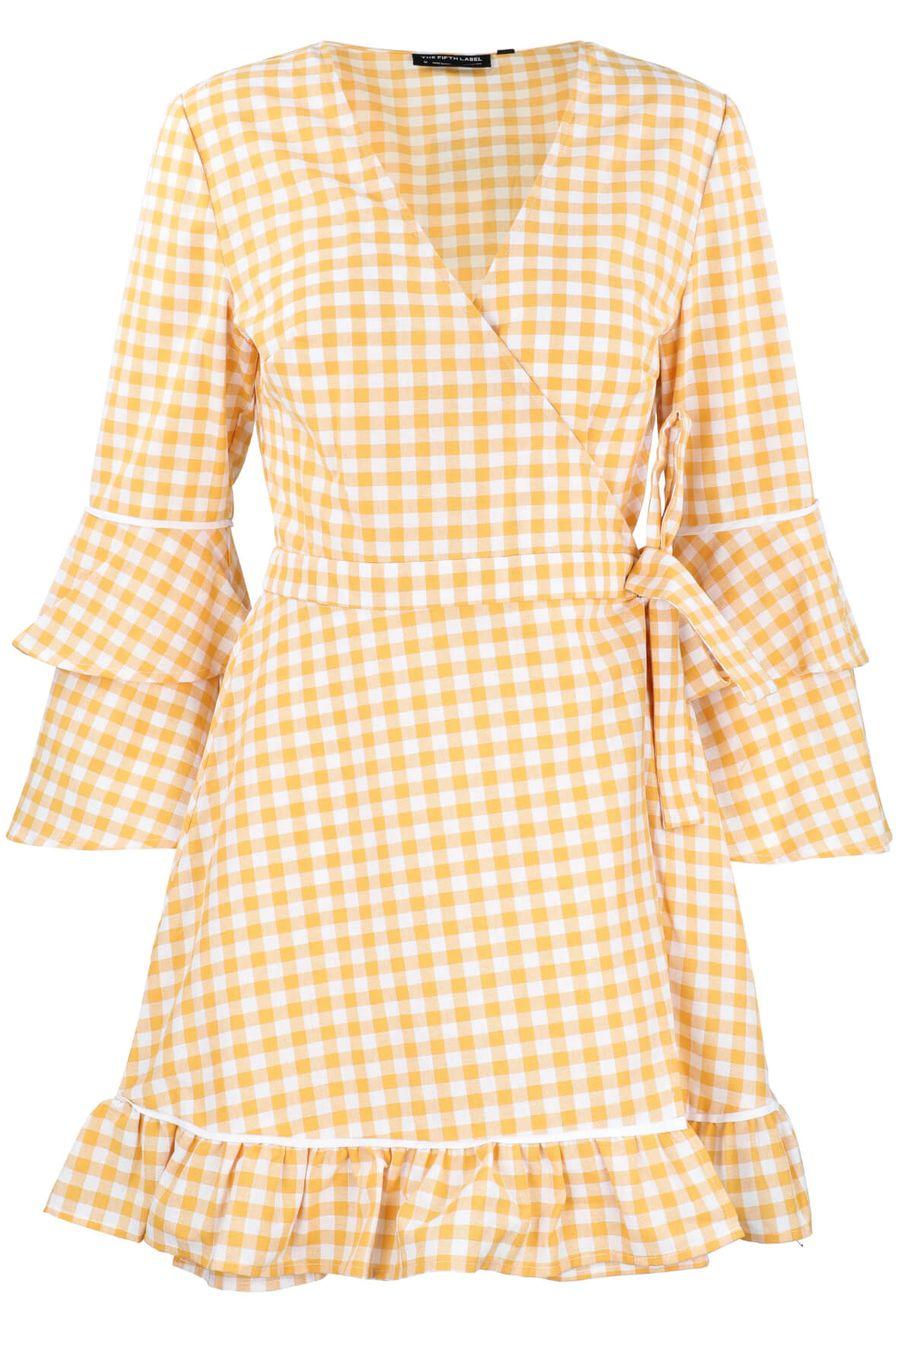 the-fifth-label-idylli-wrap-dress-1